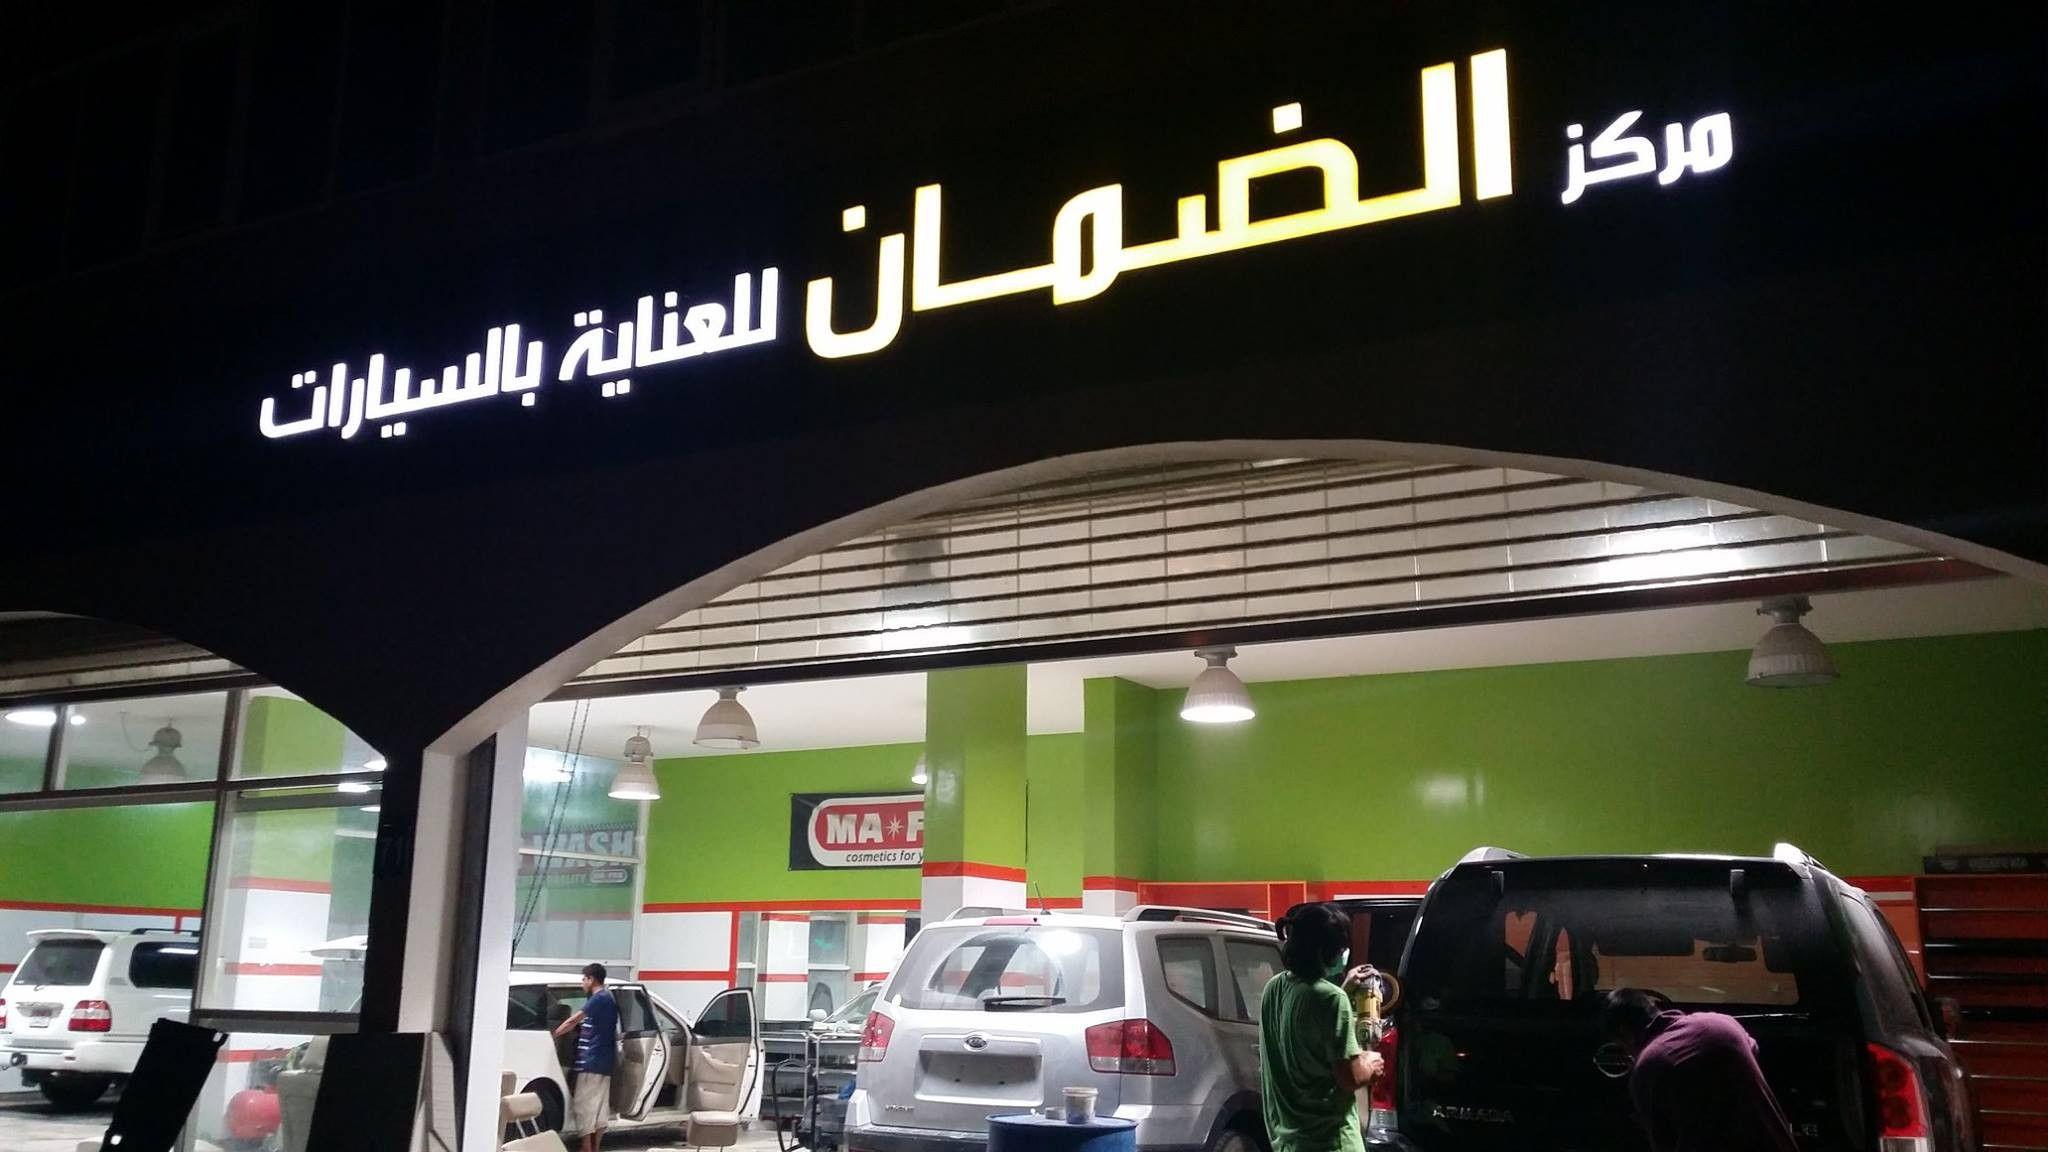 Al Dhaman Car Care   Car washing   Abu Dhabi   UAE